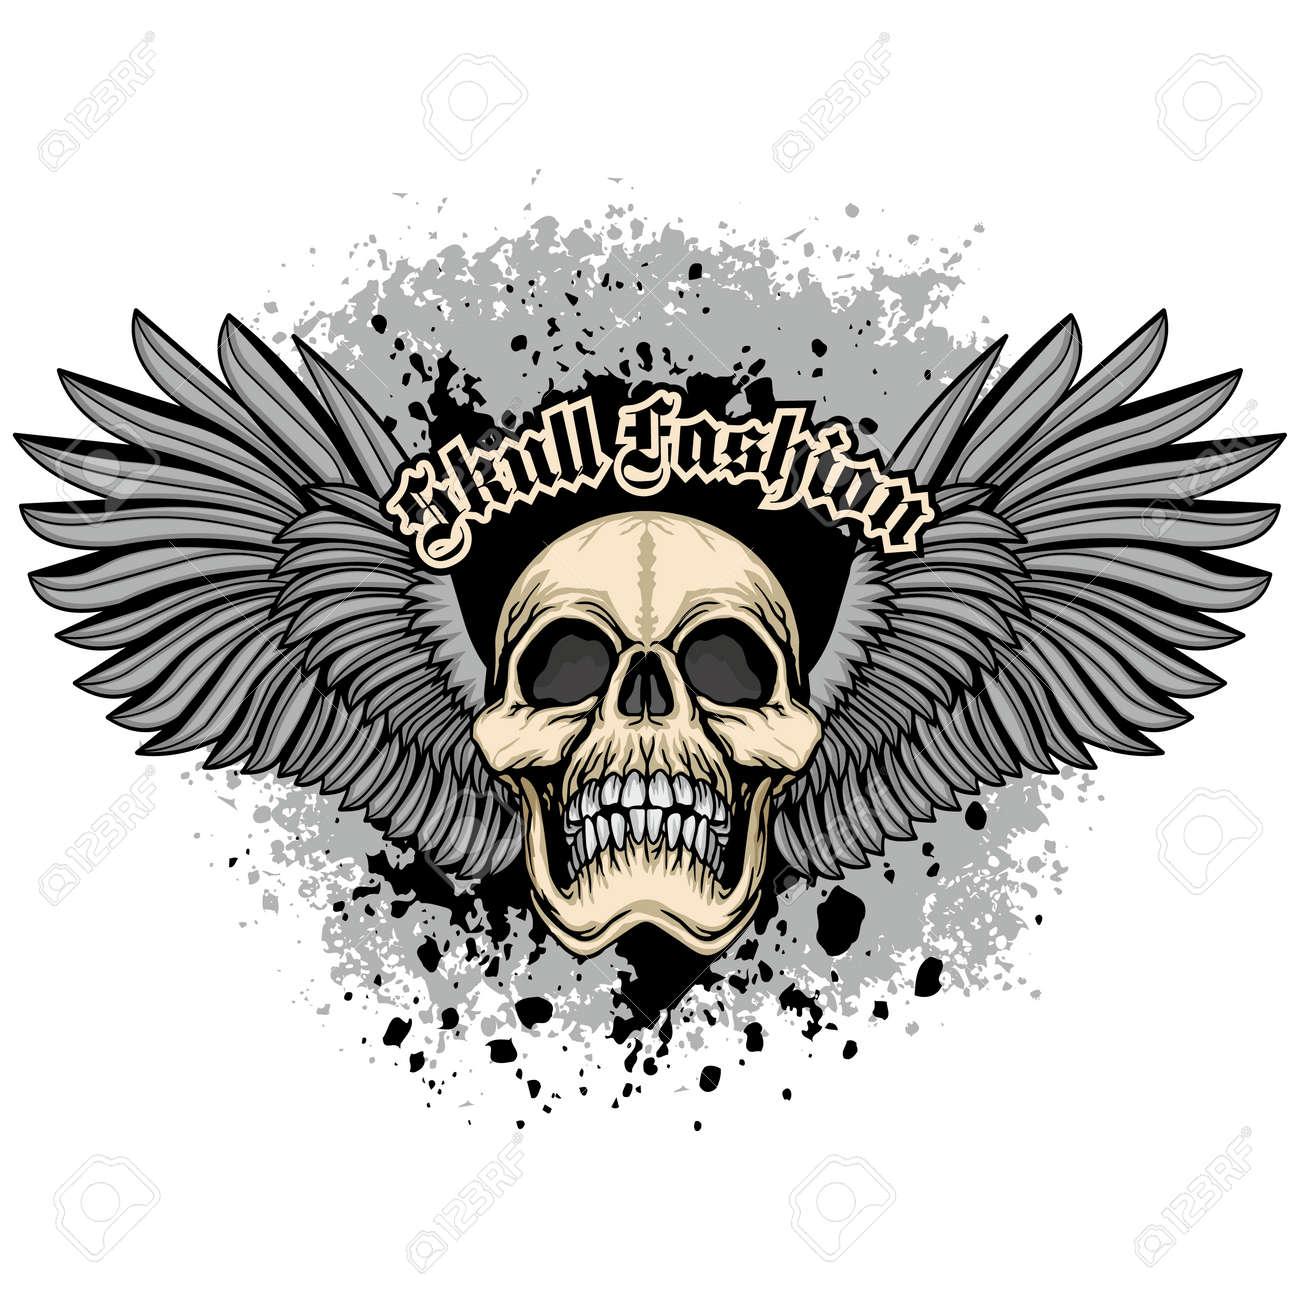 Gothic sign with skull, grunge vintage design t shirts - 170296998